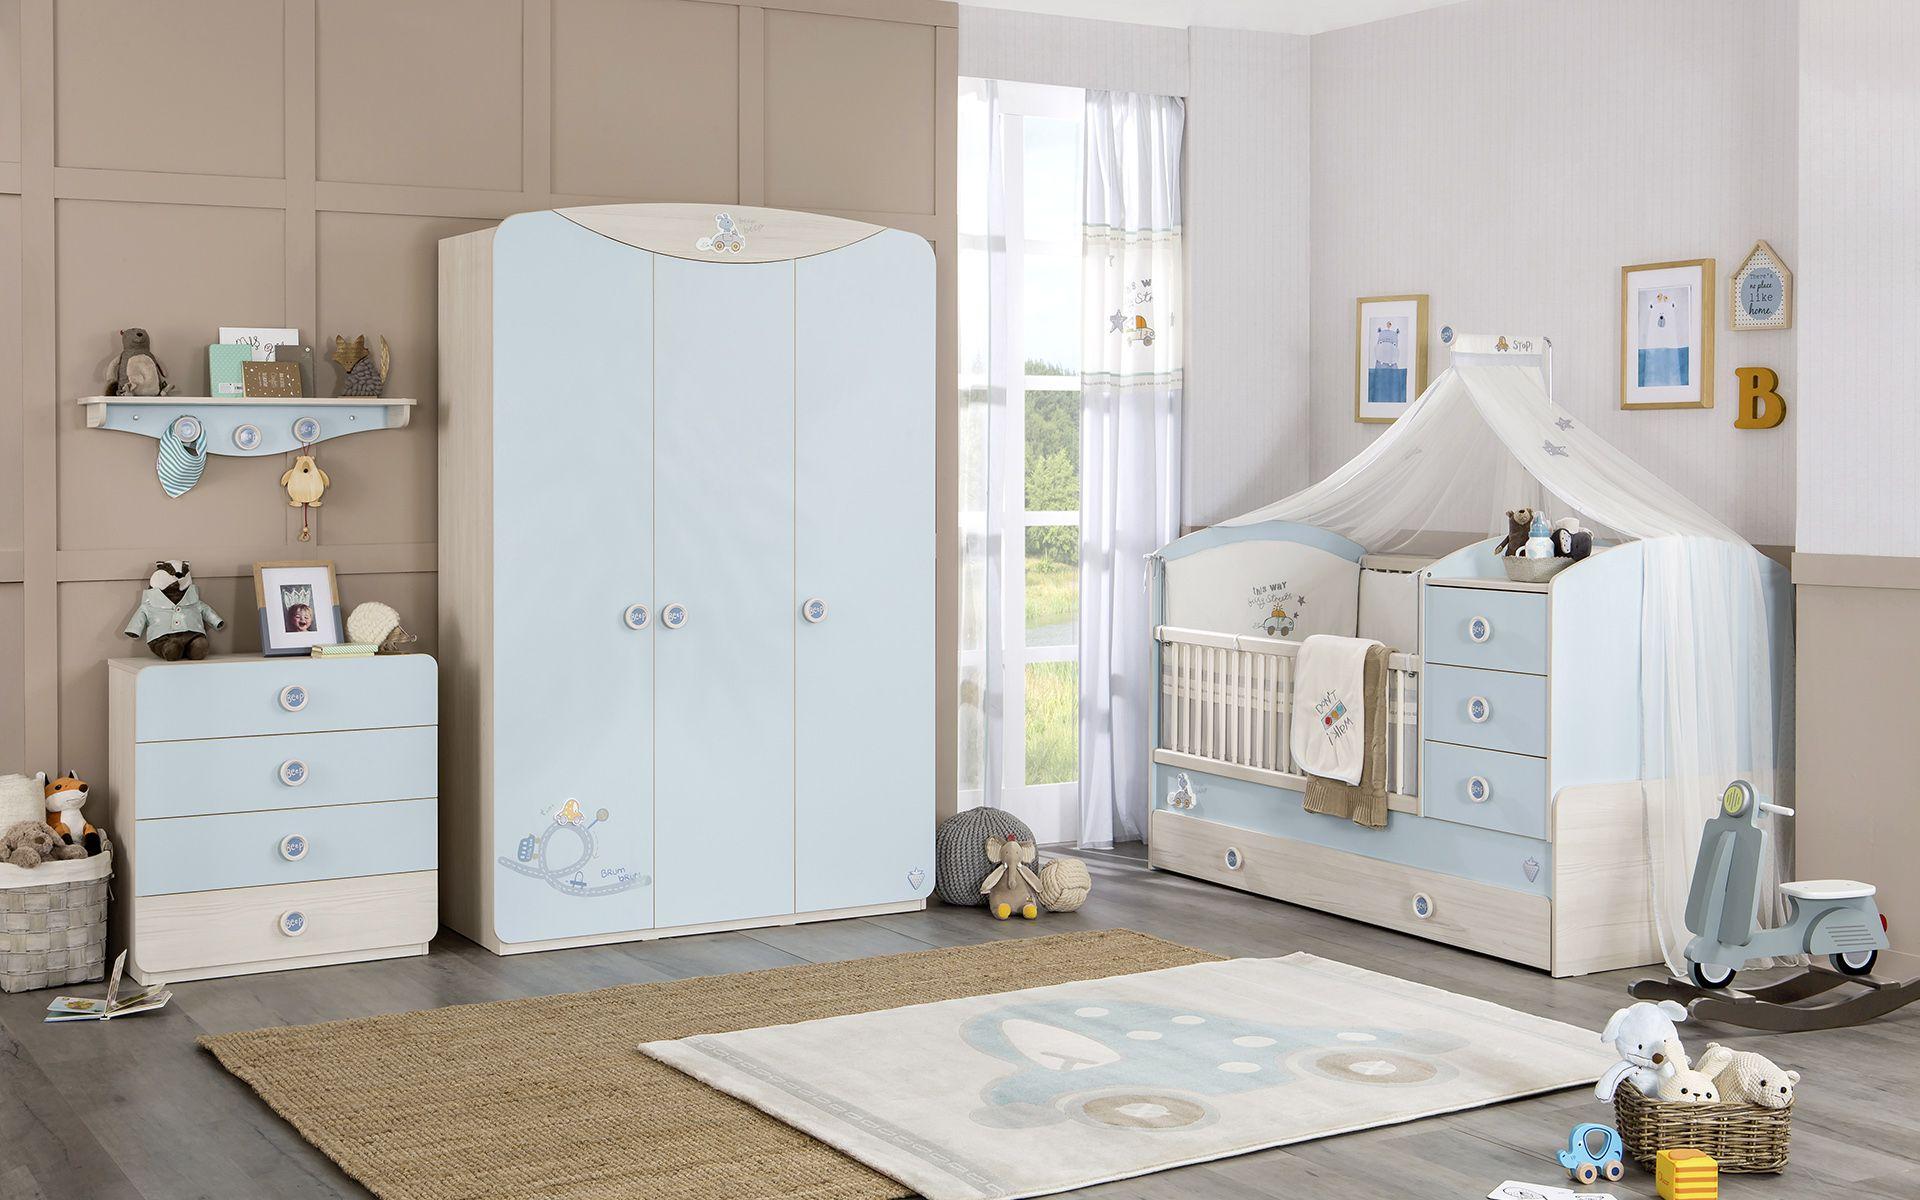 CHAMBRE BABY BOY 1 – lit barreau enfant – armoire – Cilek